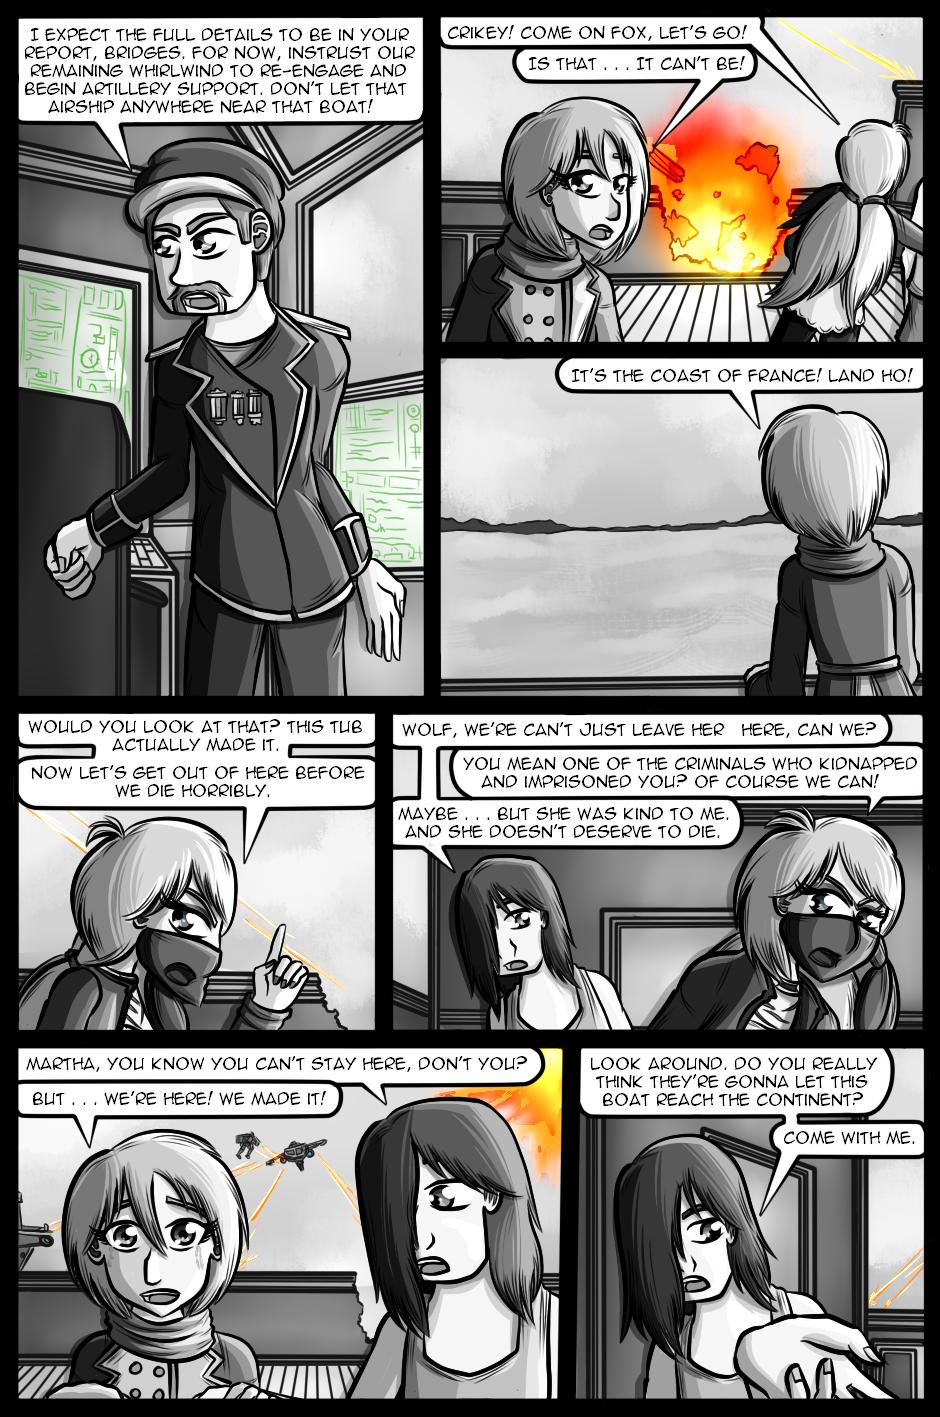 Fire Suppression, Part 36